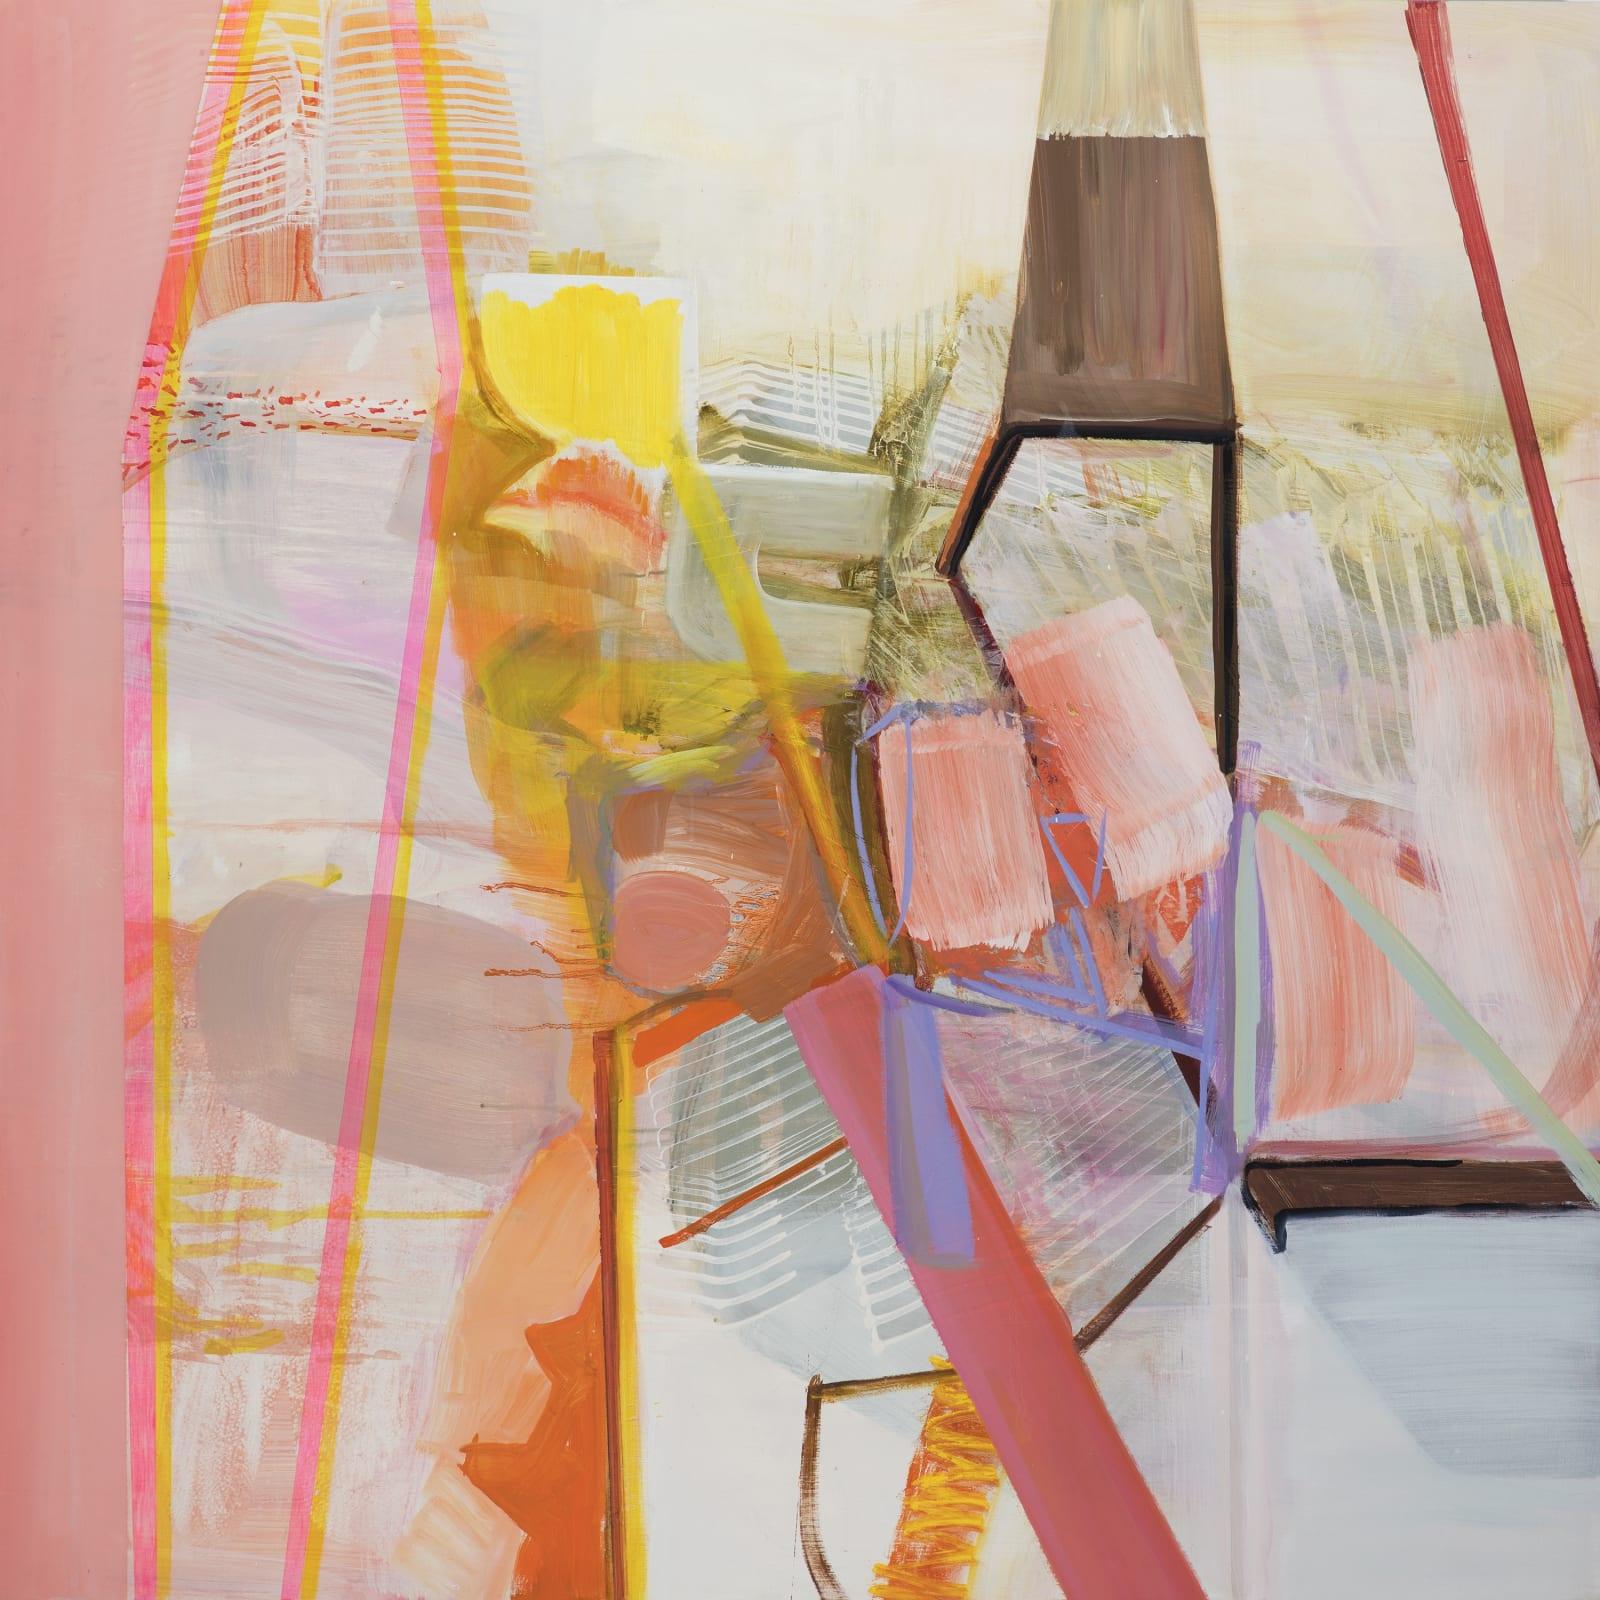 Laurie Danial, Talk Space, 2020